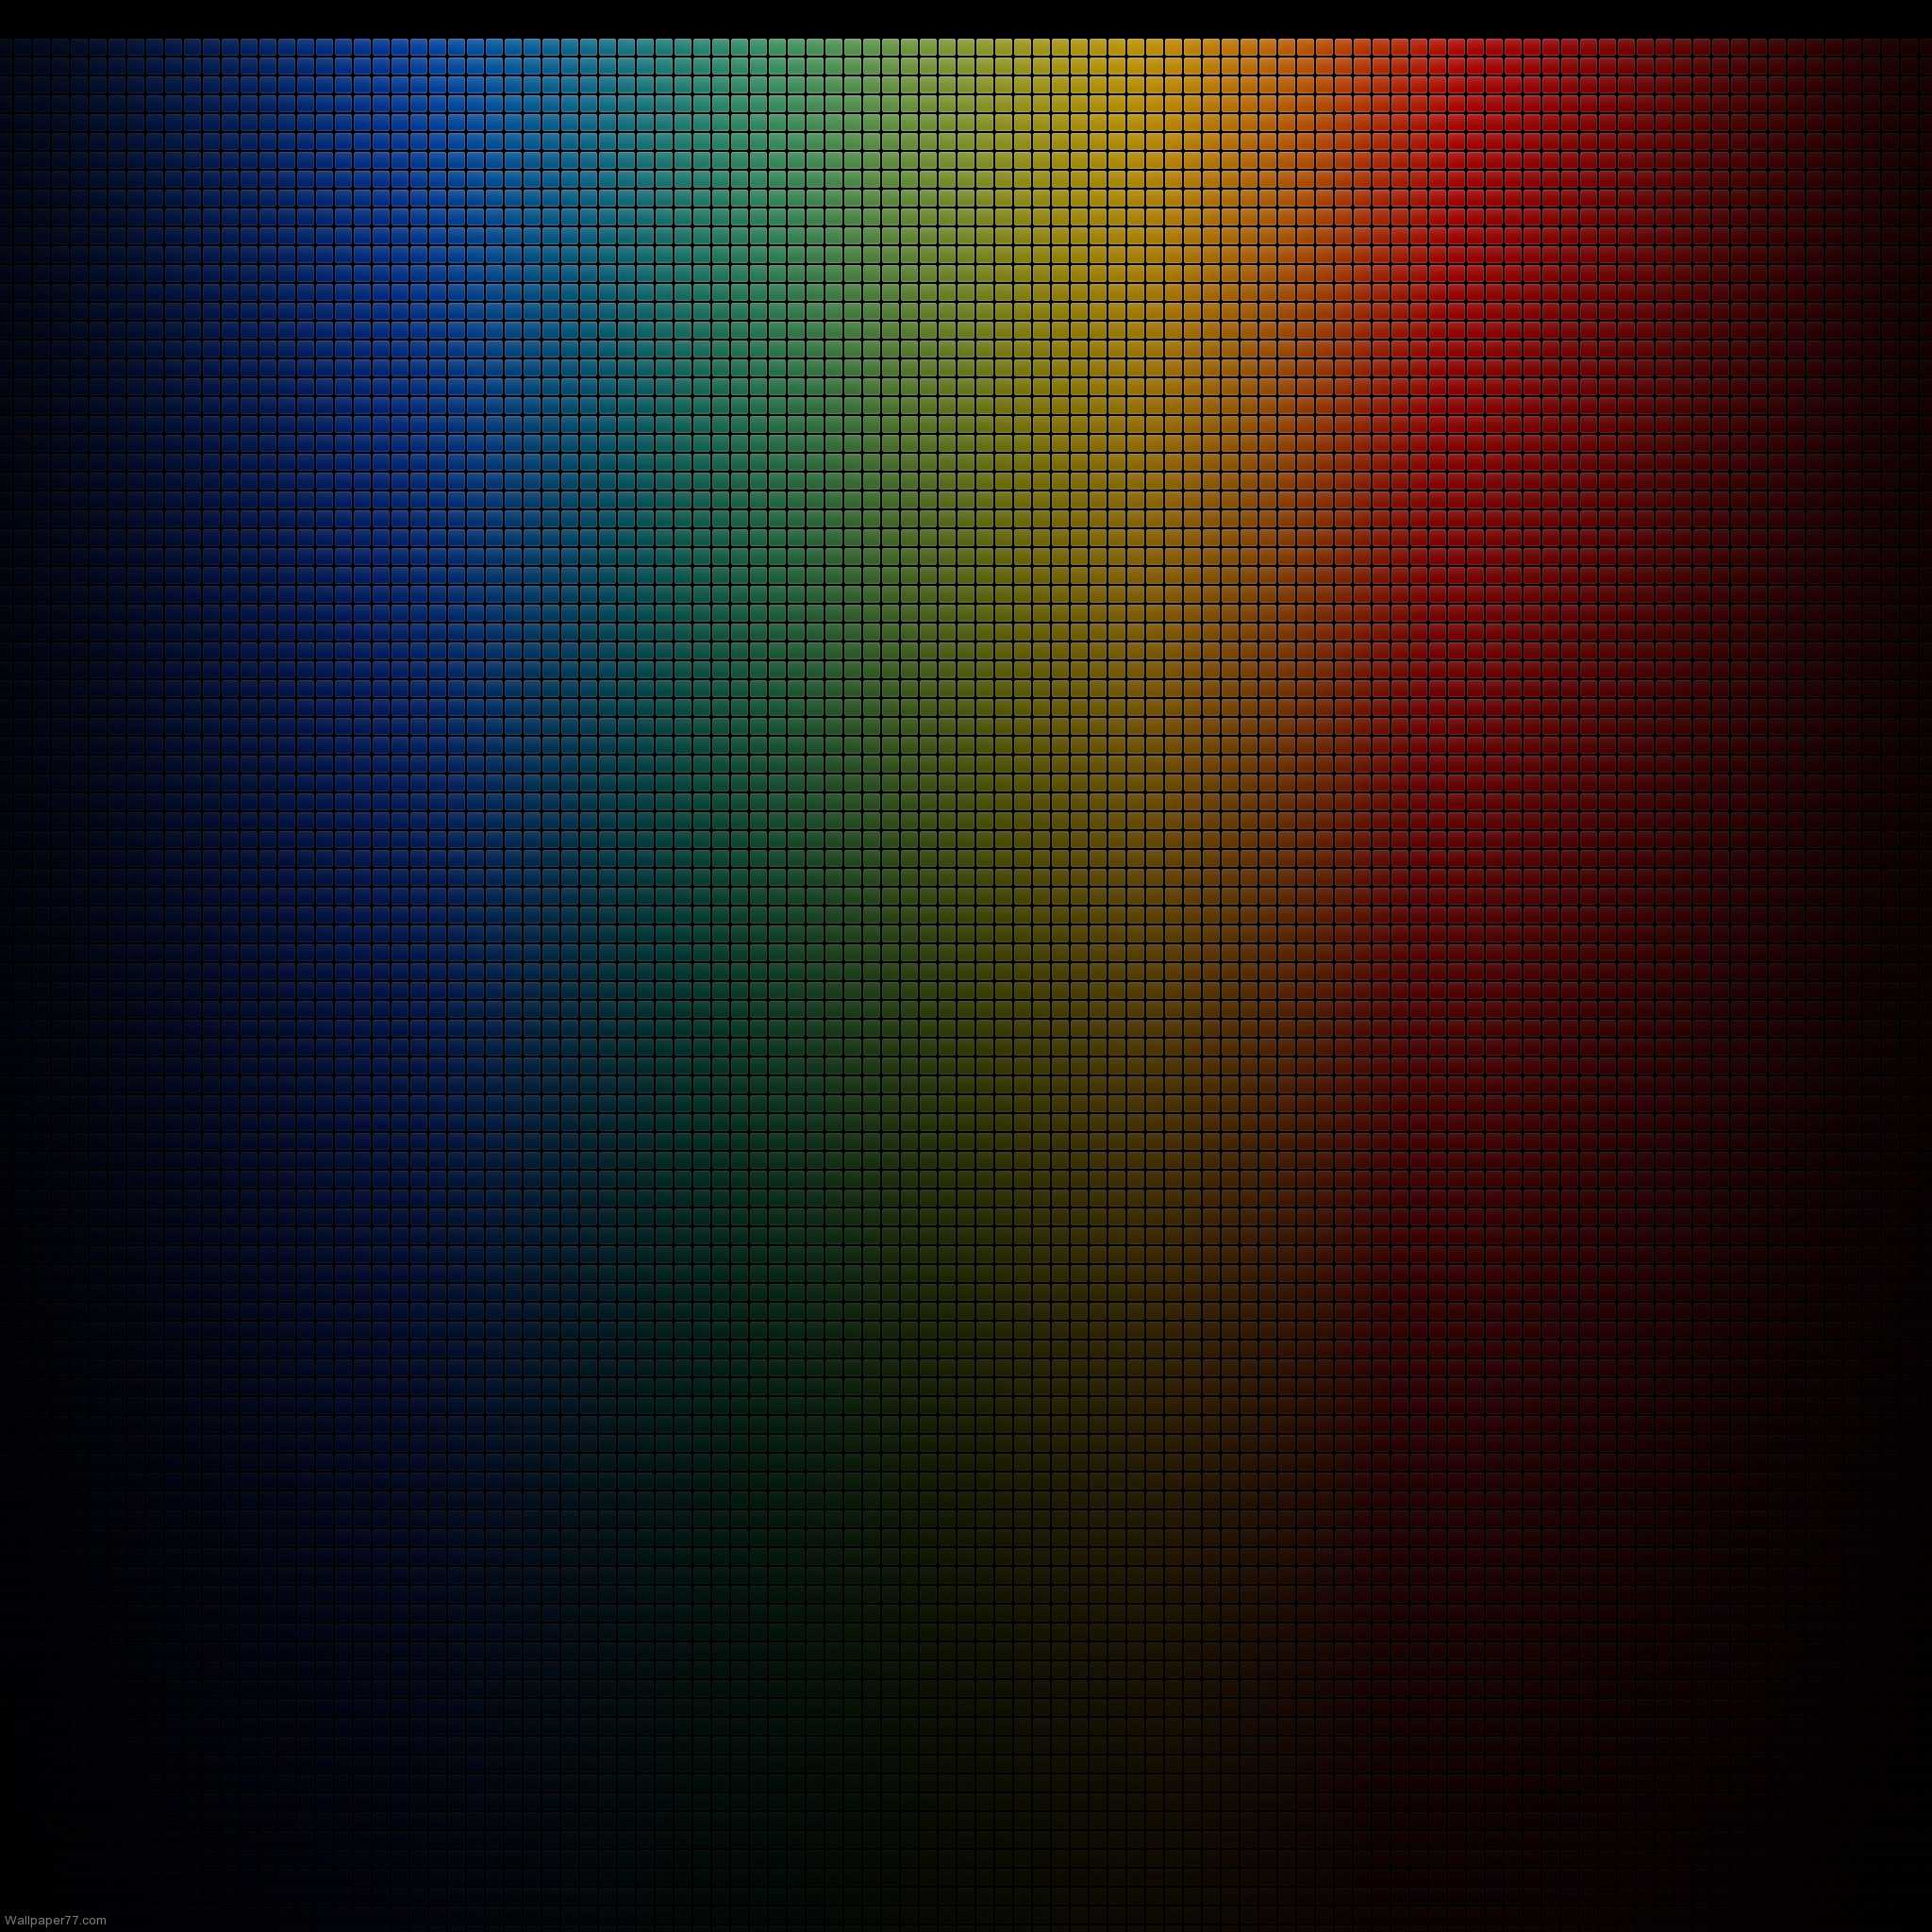 Retina ipad 3 wallpaper ipad wallpaper retina display wallpaper the 2048x2048